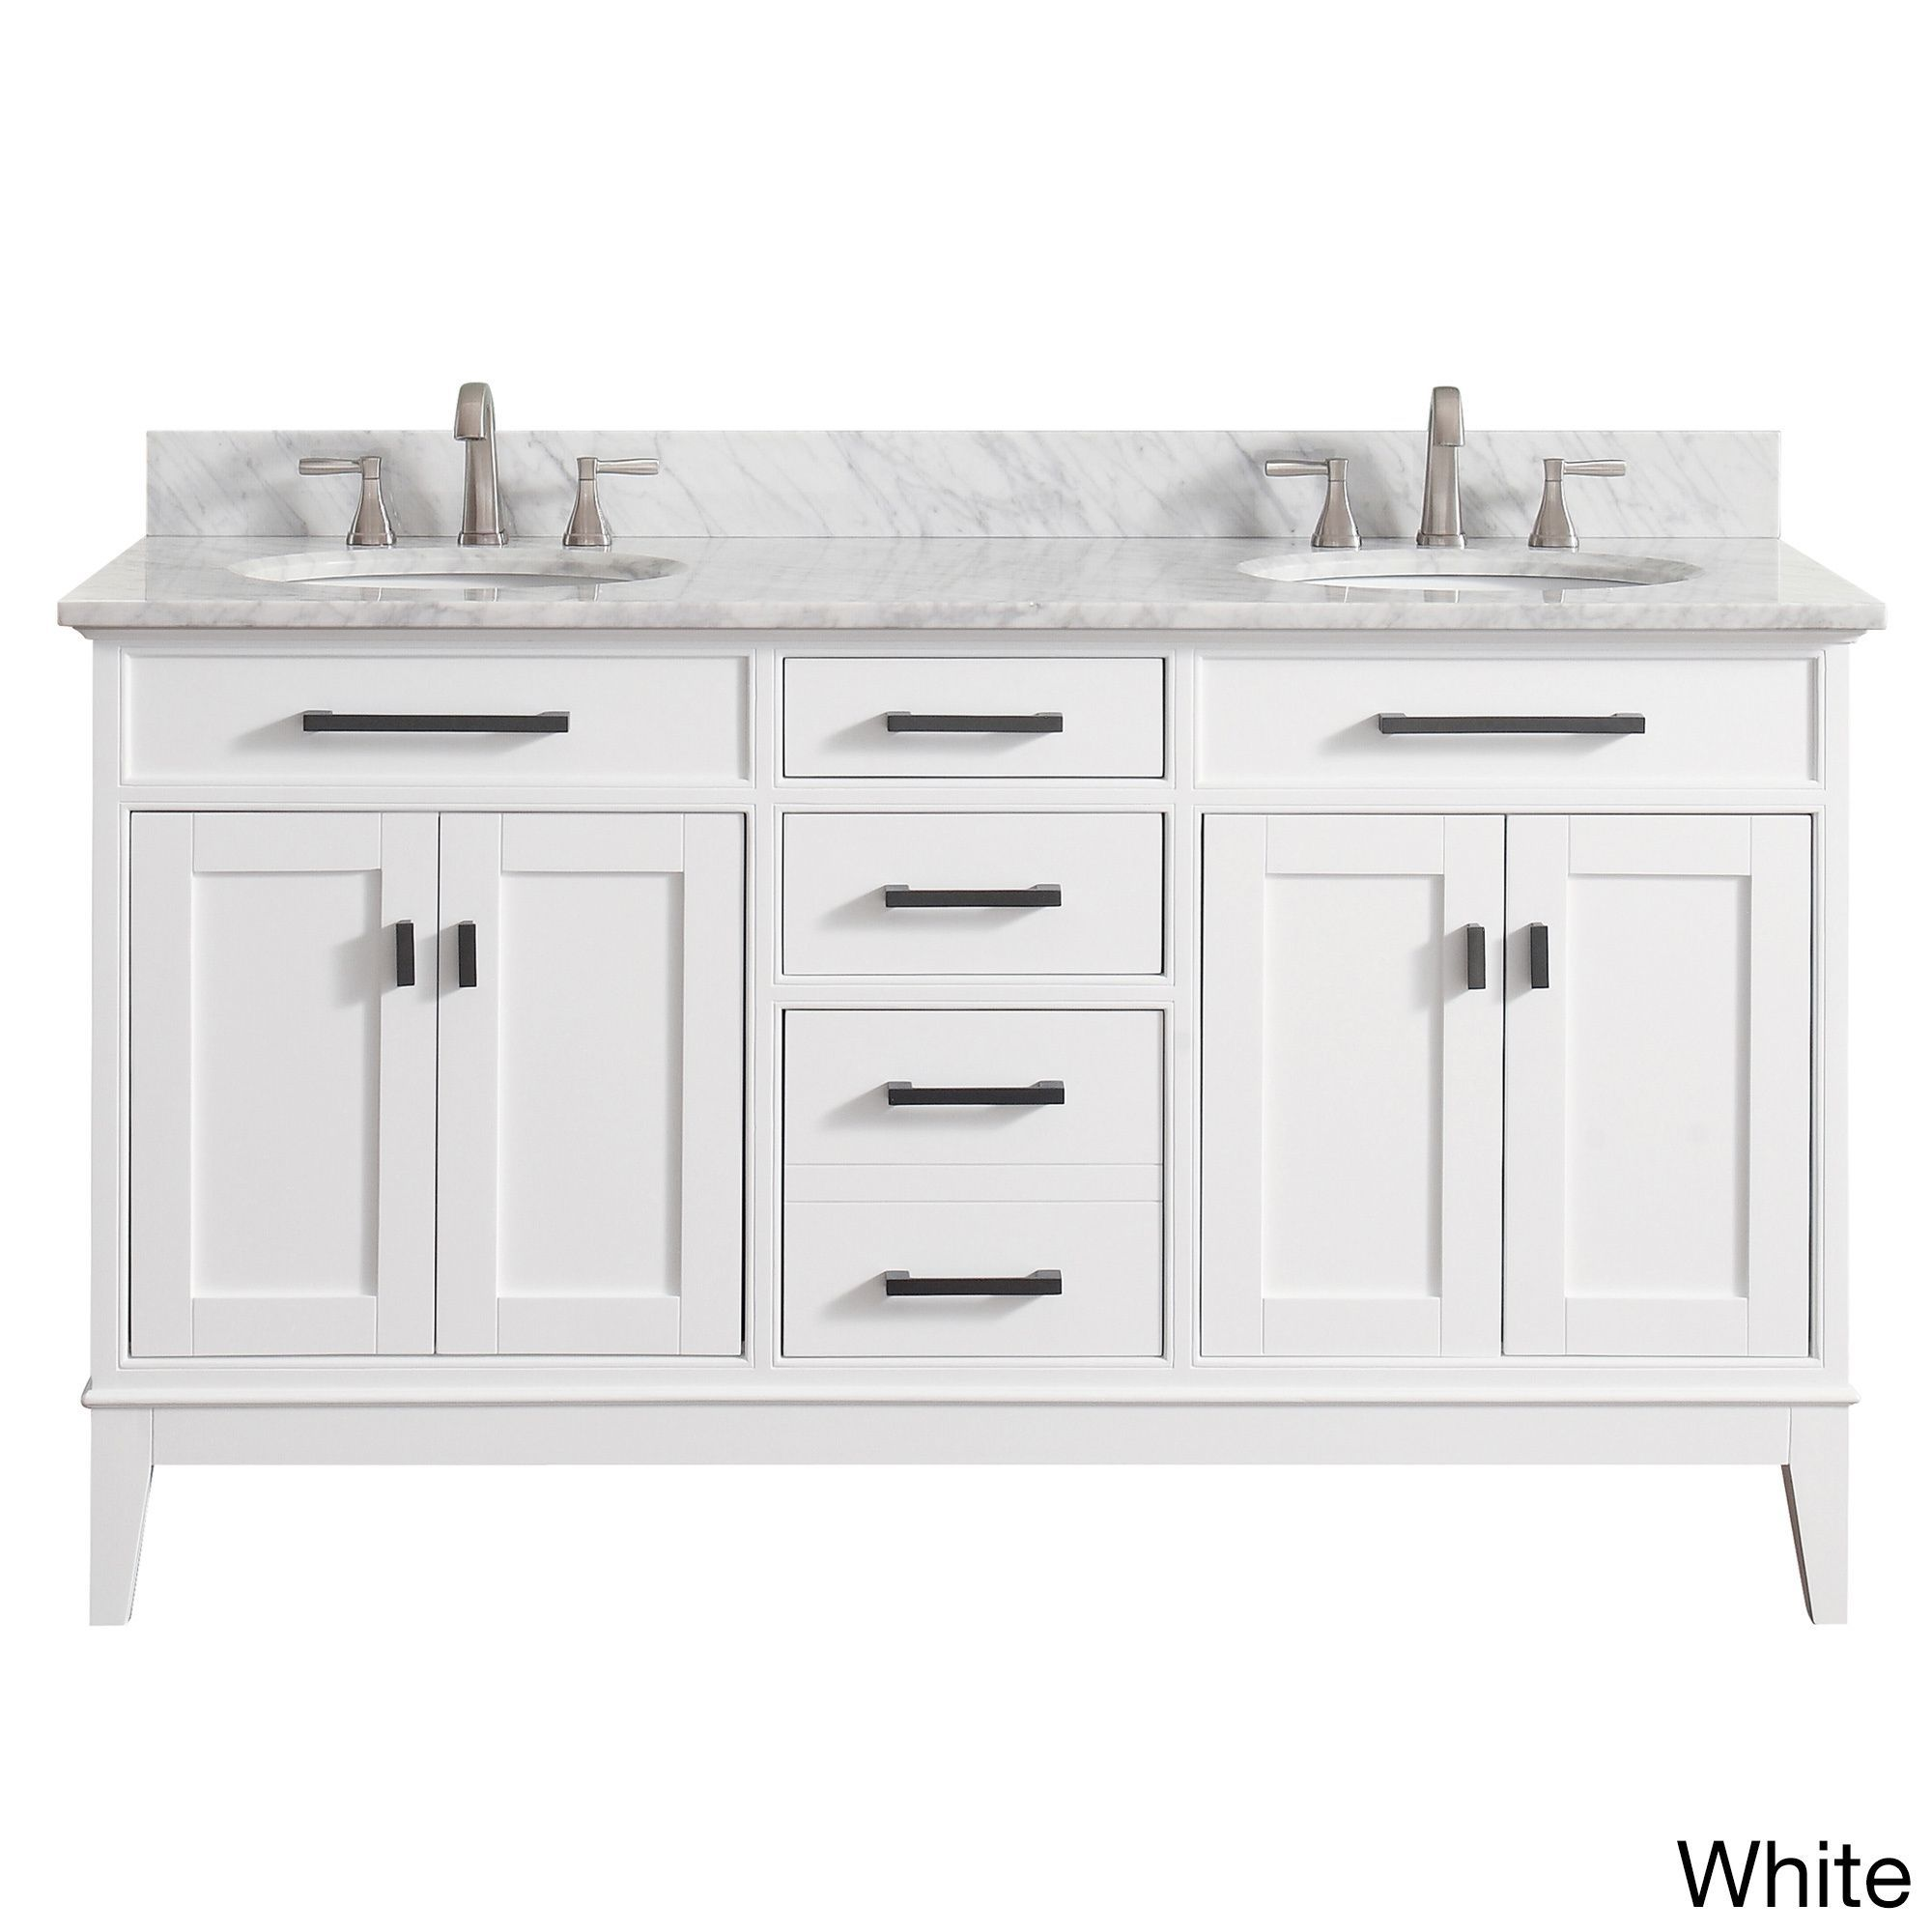 Avanity Madison 61 Inch Double Sink White Finish Vanity Combo Madison 61 In Vanity In White W White Top Size Double Vanities Vanity Sink Beige Marble Double Sink Vanity